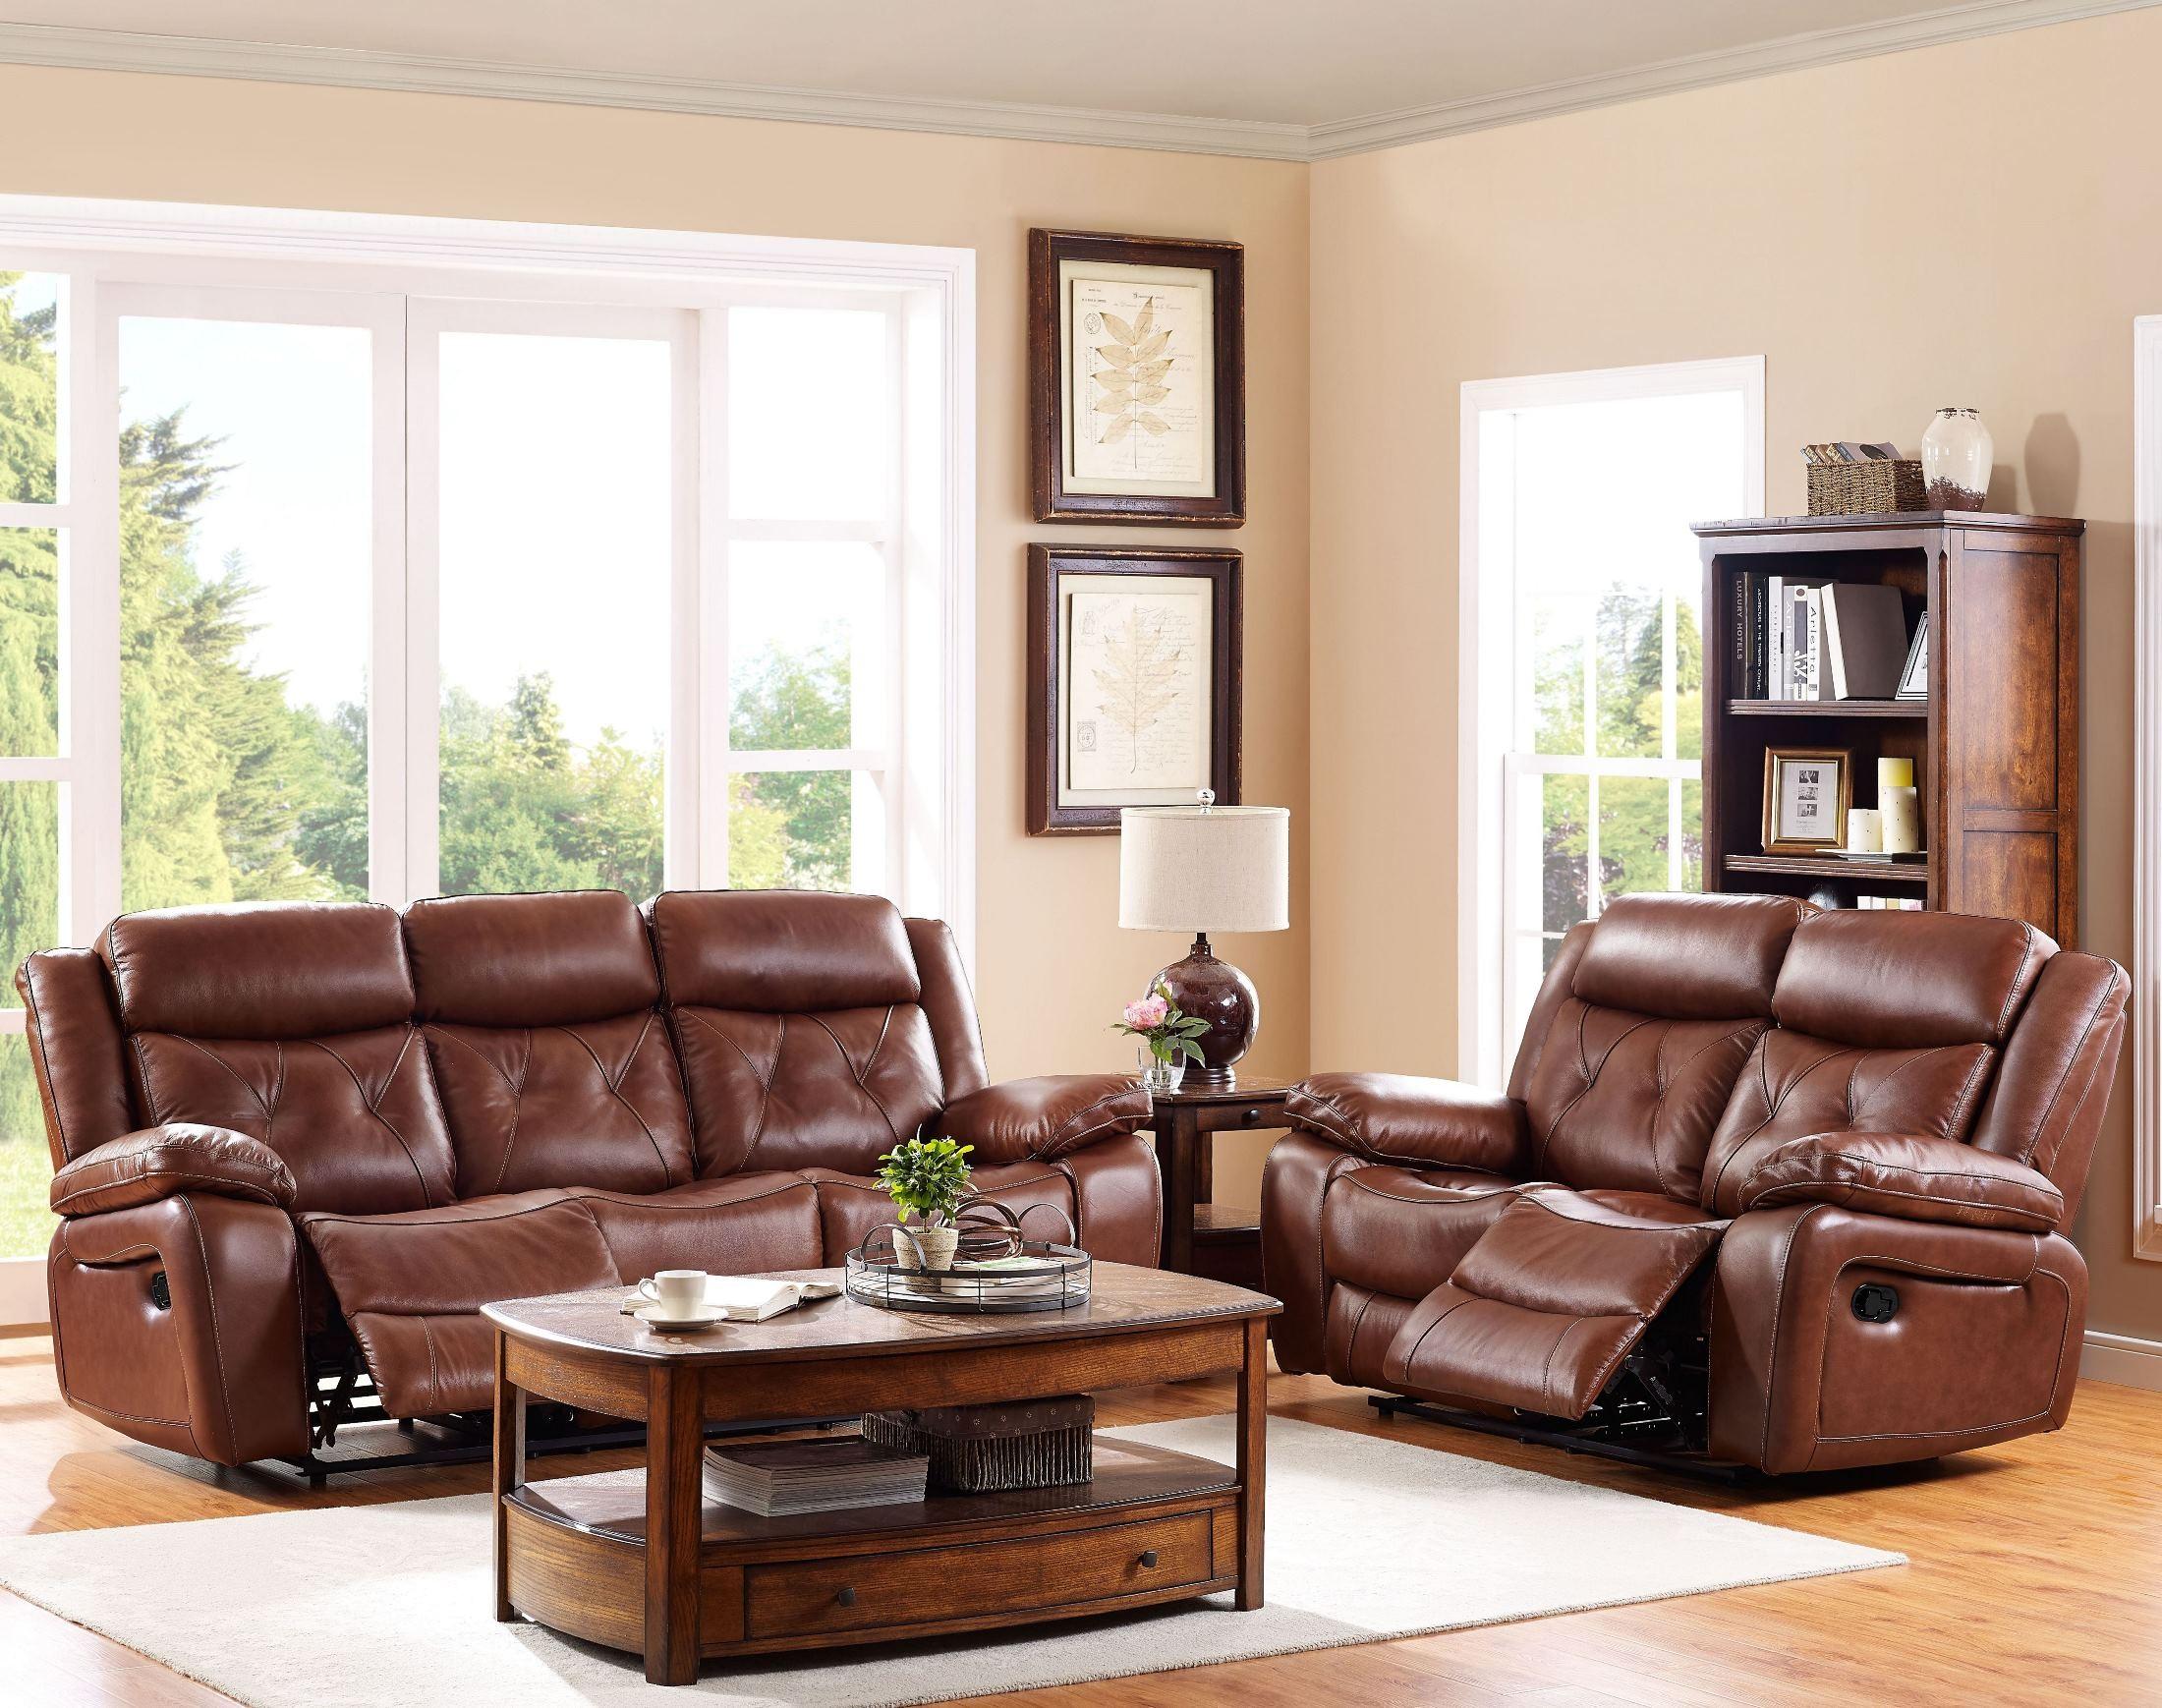 Benedict light brown power reclining living room set for Light brown living room